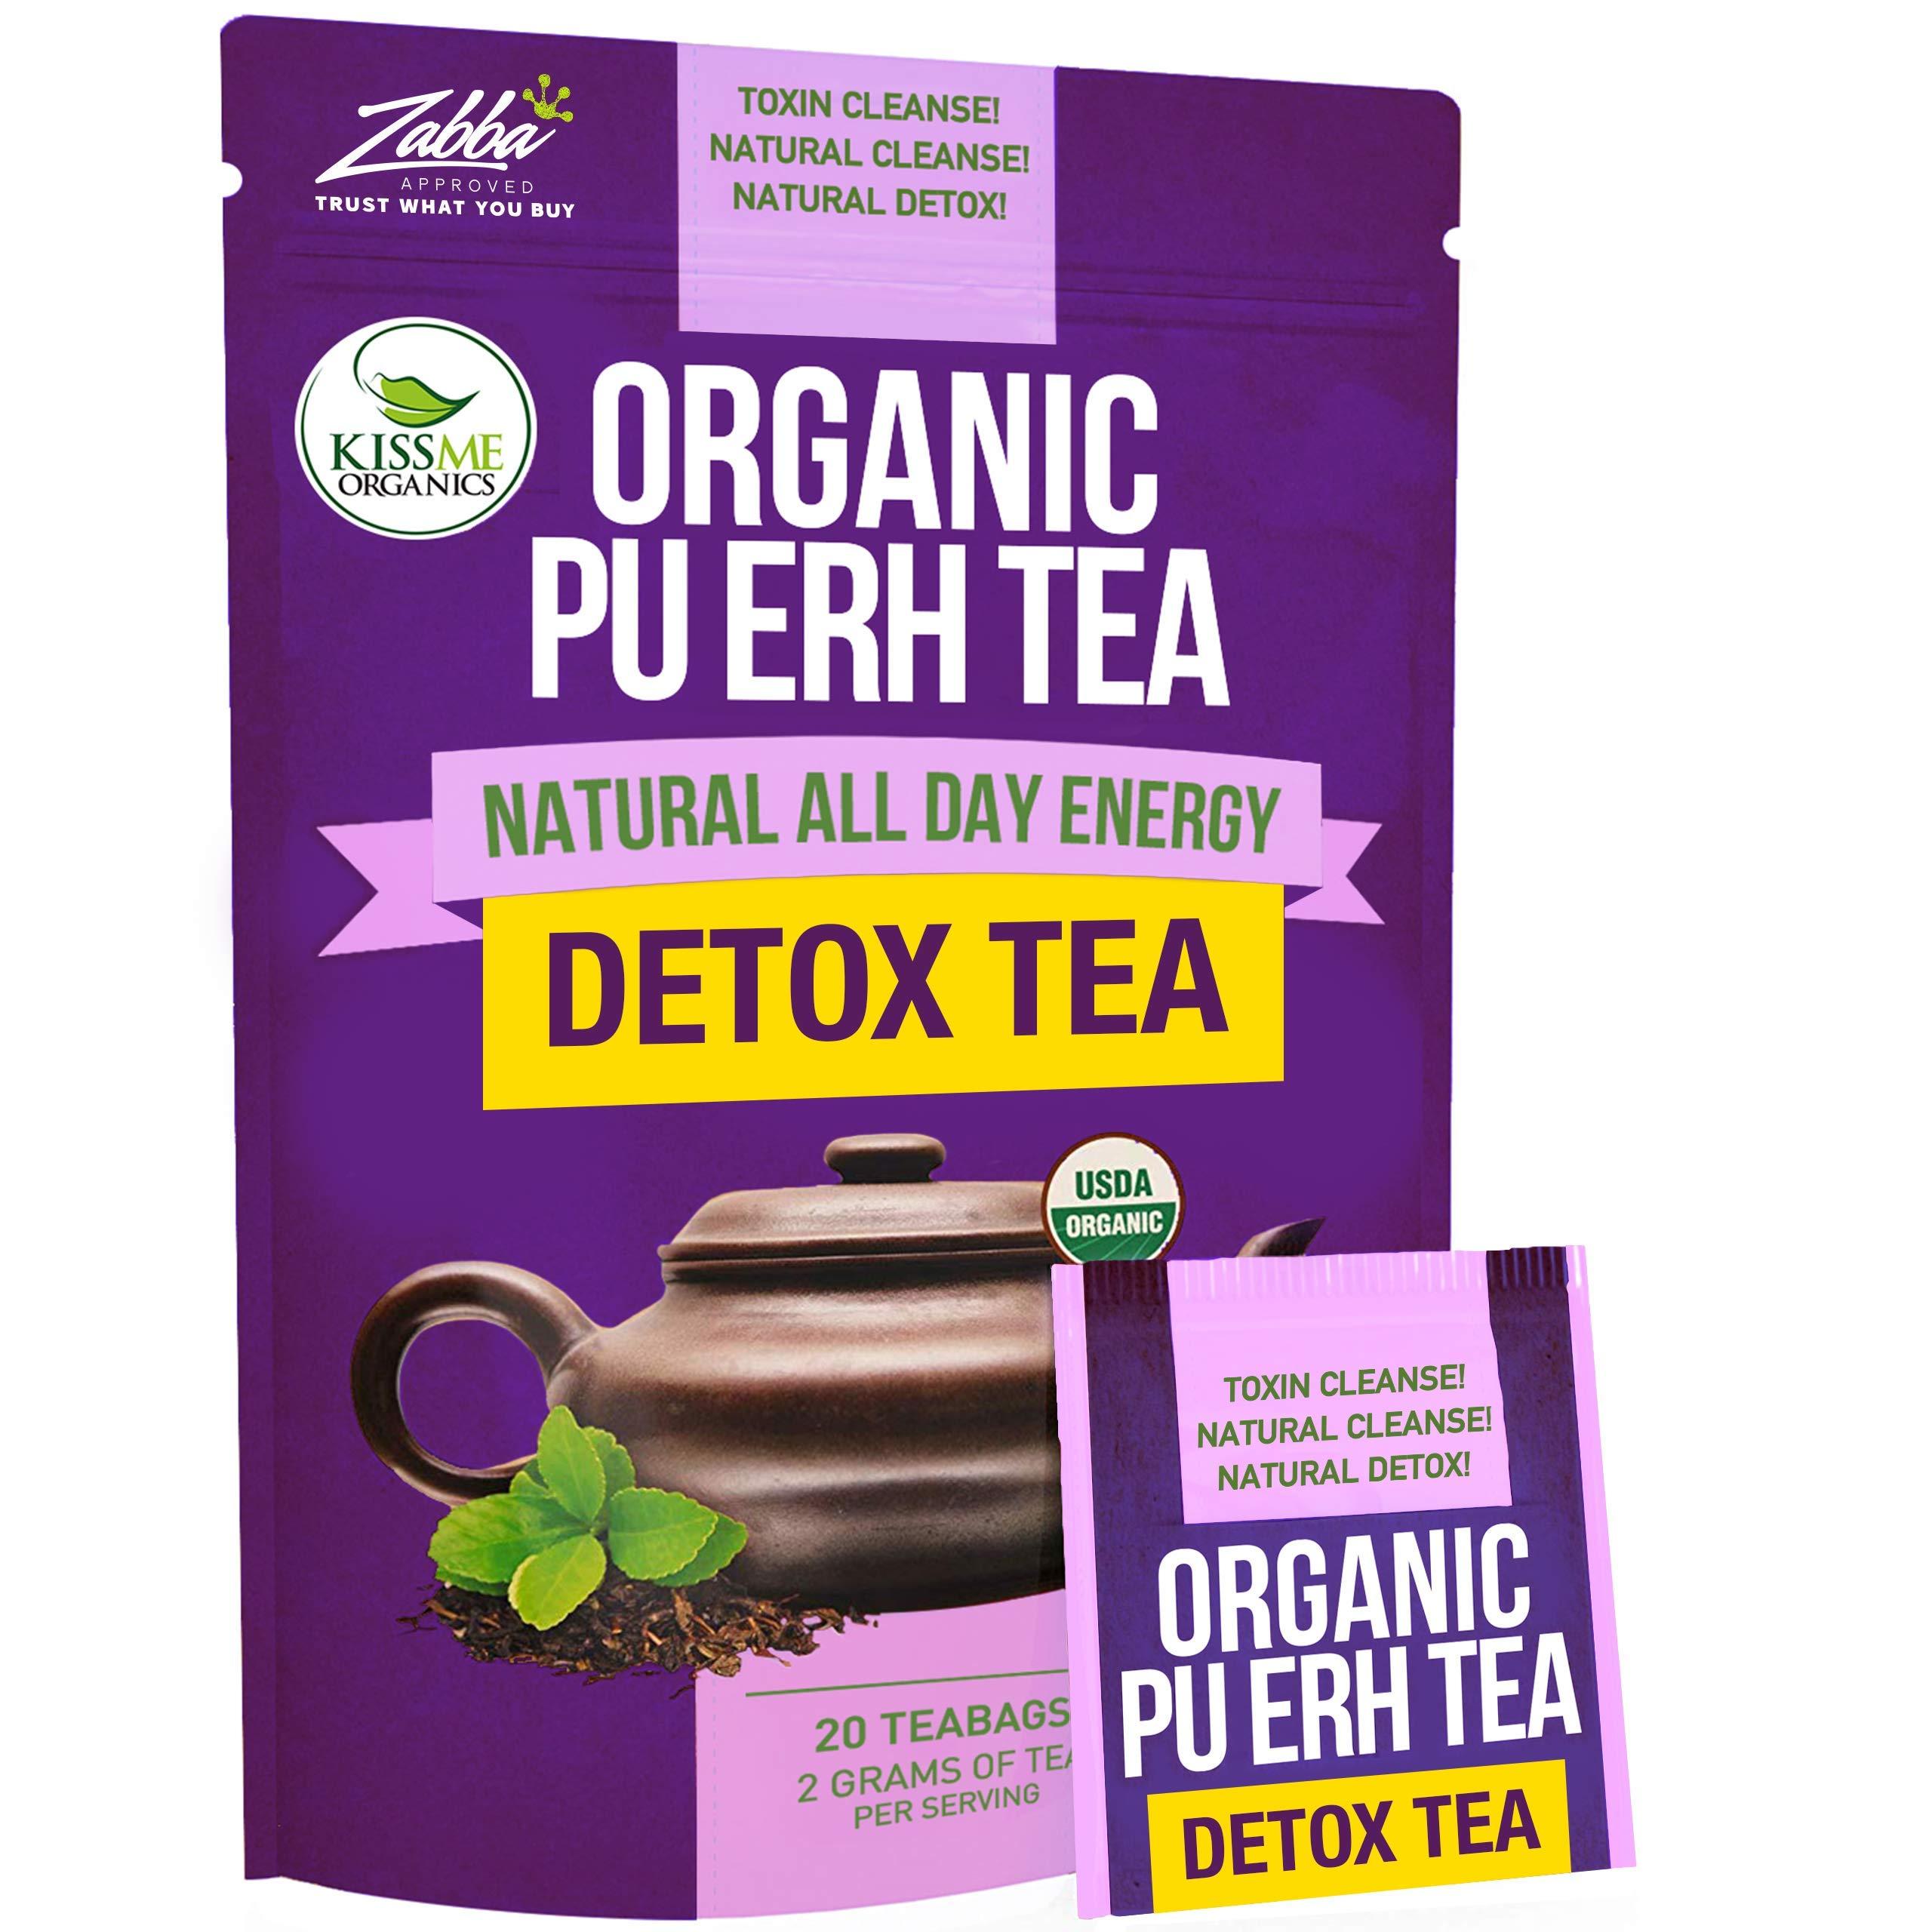 Organic Puerh Detox Tea - Premium Quality Fermented Puerh Tea - Energizing, Detoxifying and Delicious - Aged Black Yunnan Tea - 20 Teabags